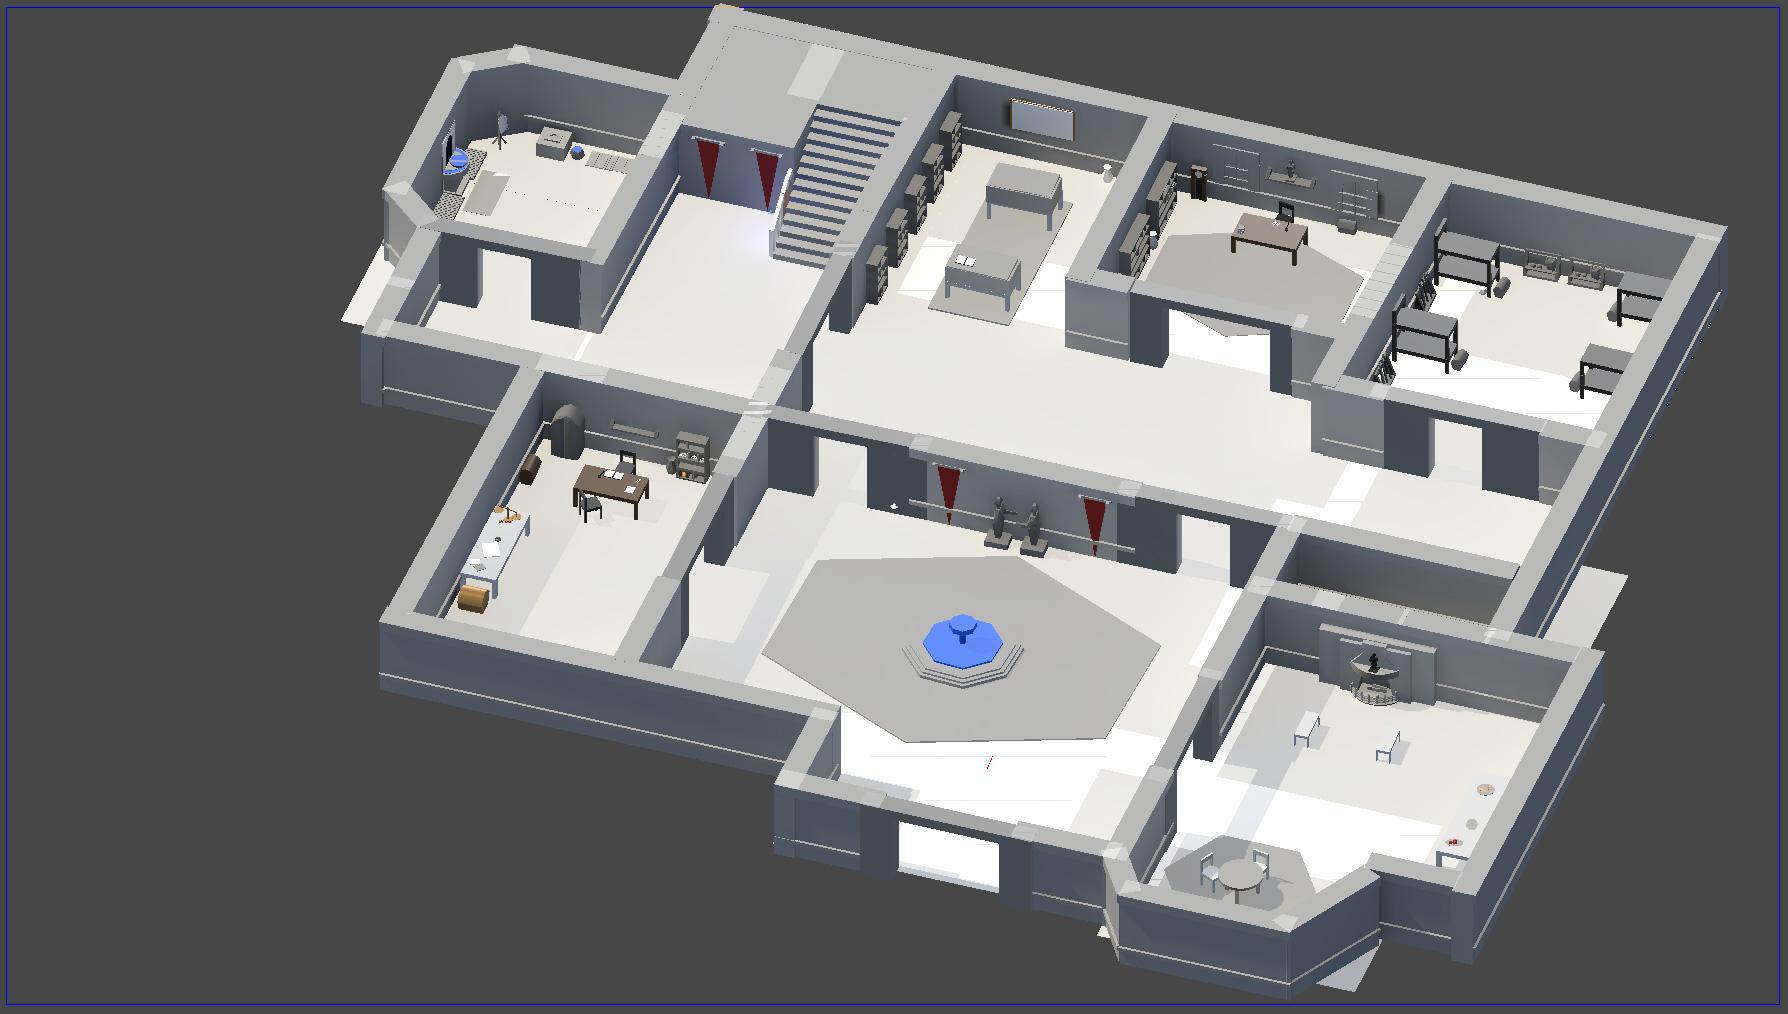 vtc-headquarters-blockout.jpg